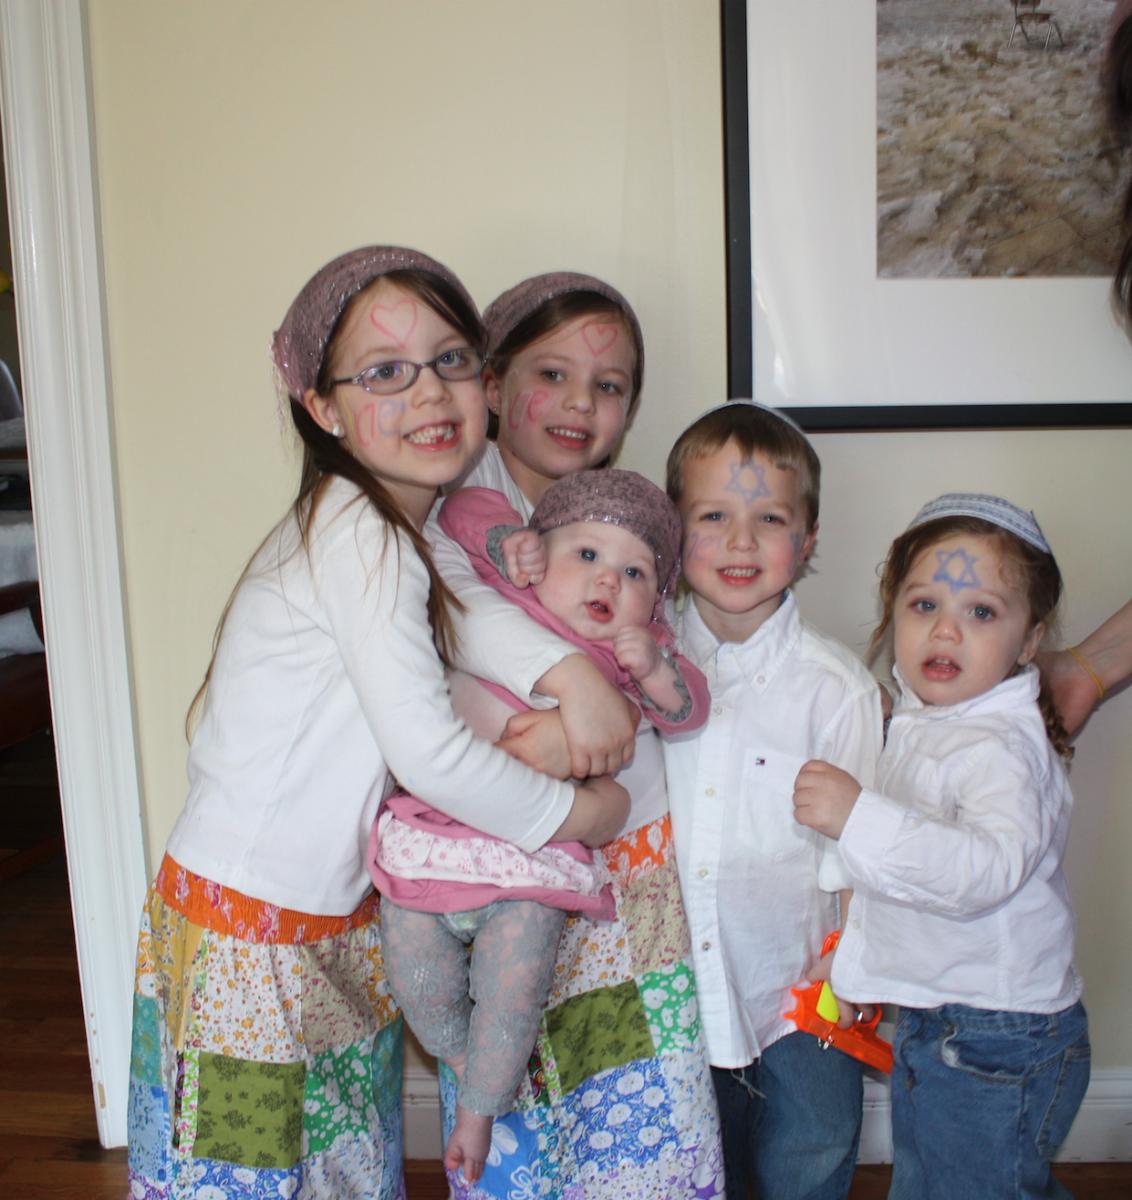 Jamie Geller Family Dressed Israeli